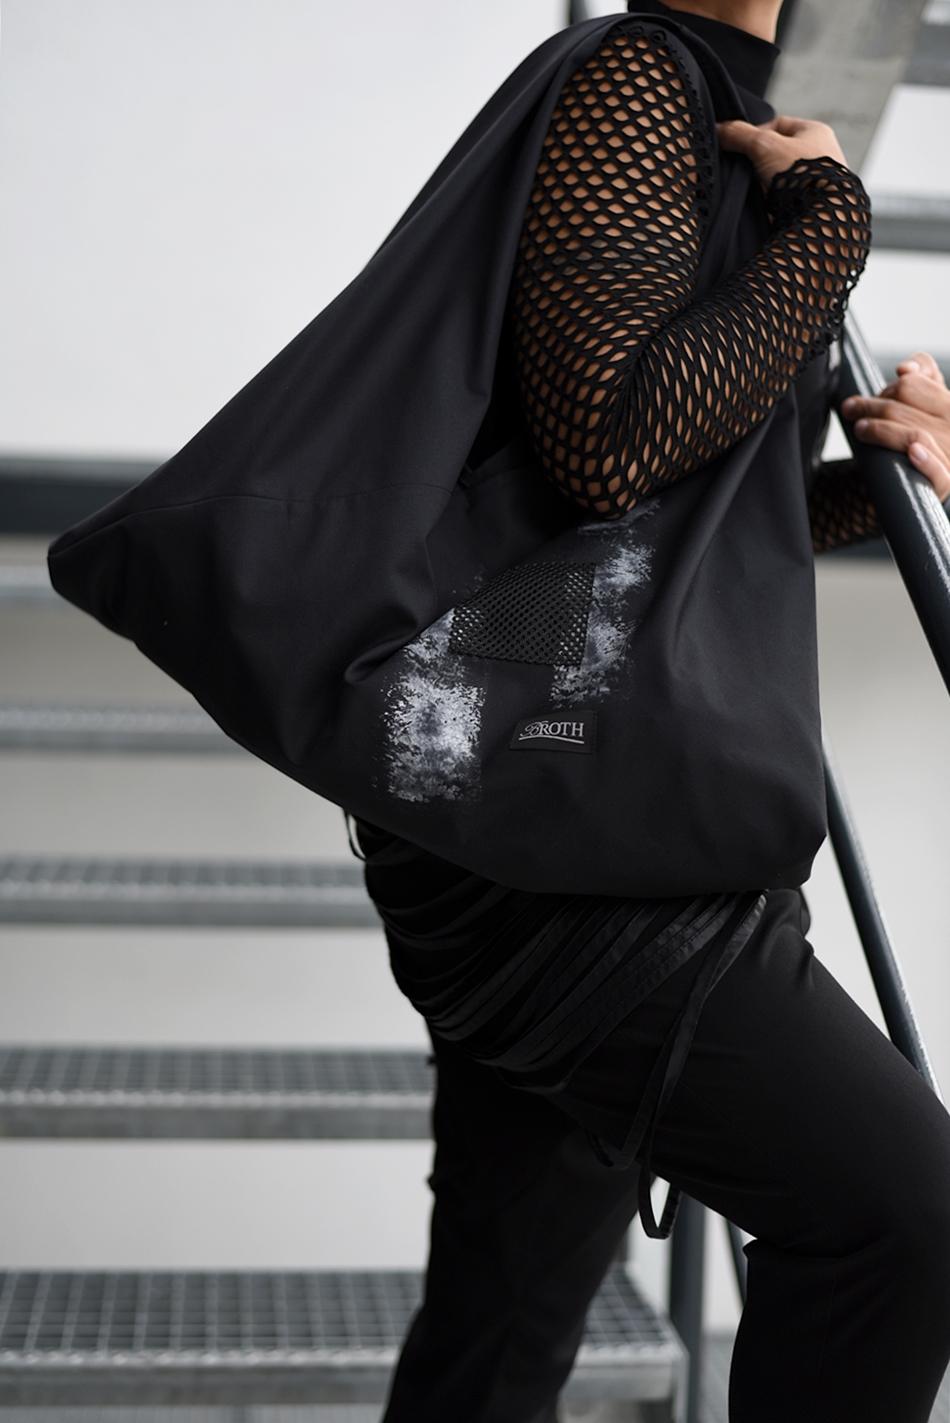 Broth_design_clothes_055